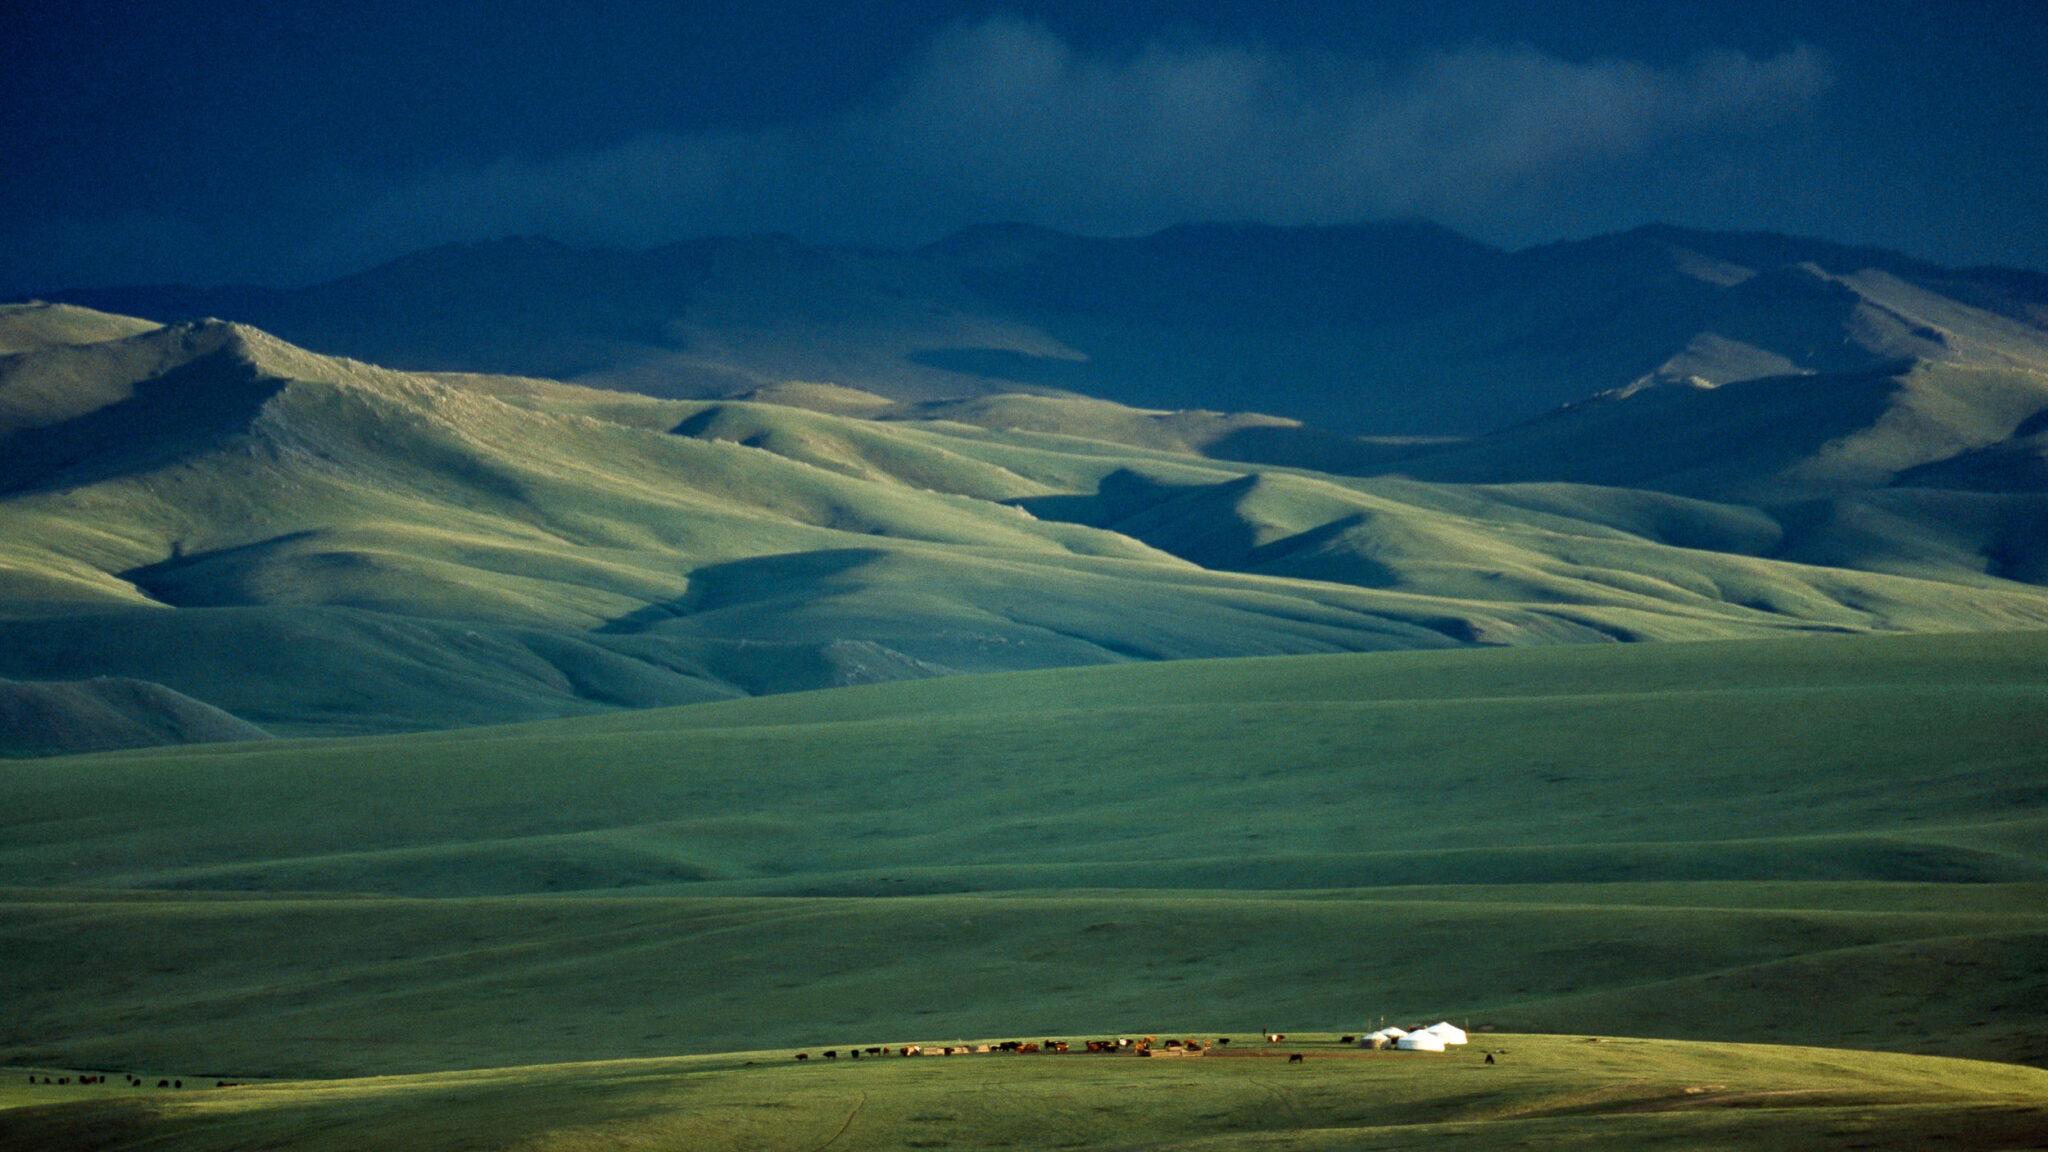 peter podpera landscpae photography mongolia 06 03 28 sinnbild final 16bit 300ppi 150x75cm oktave 5